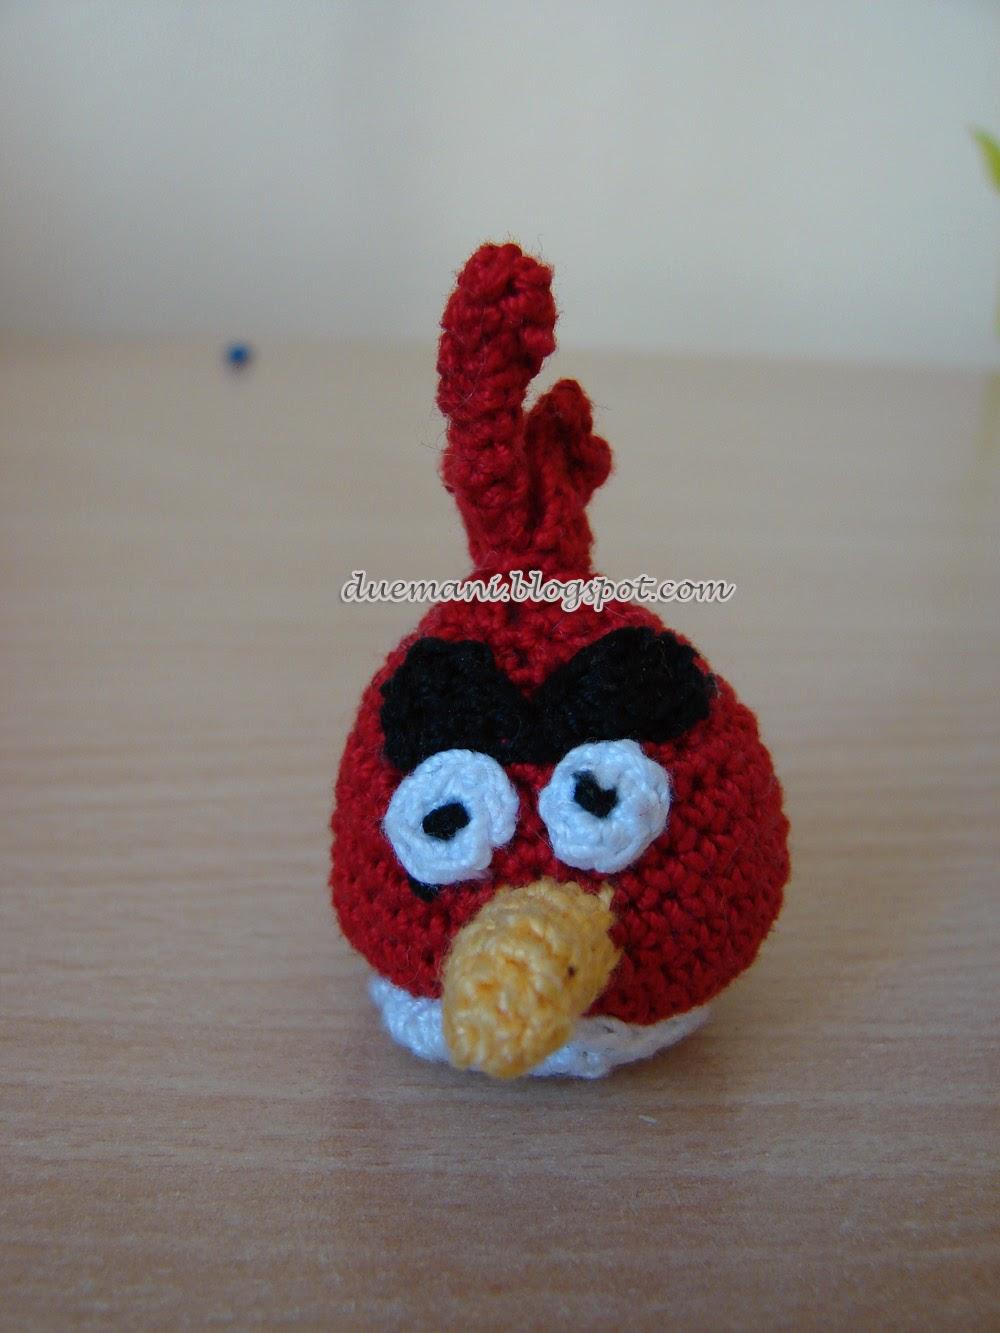 Handmade Cristina: Amigurumi Angry Birds